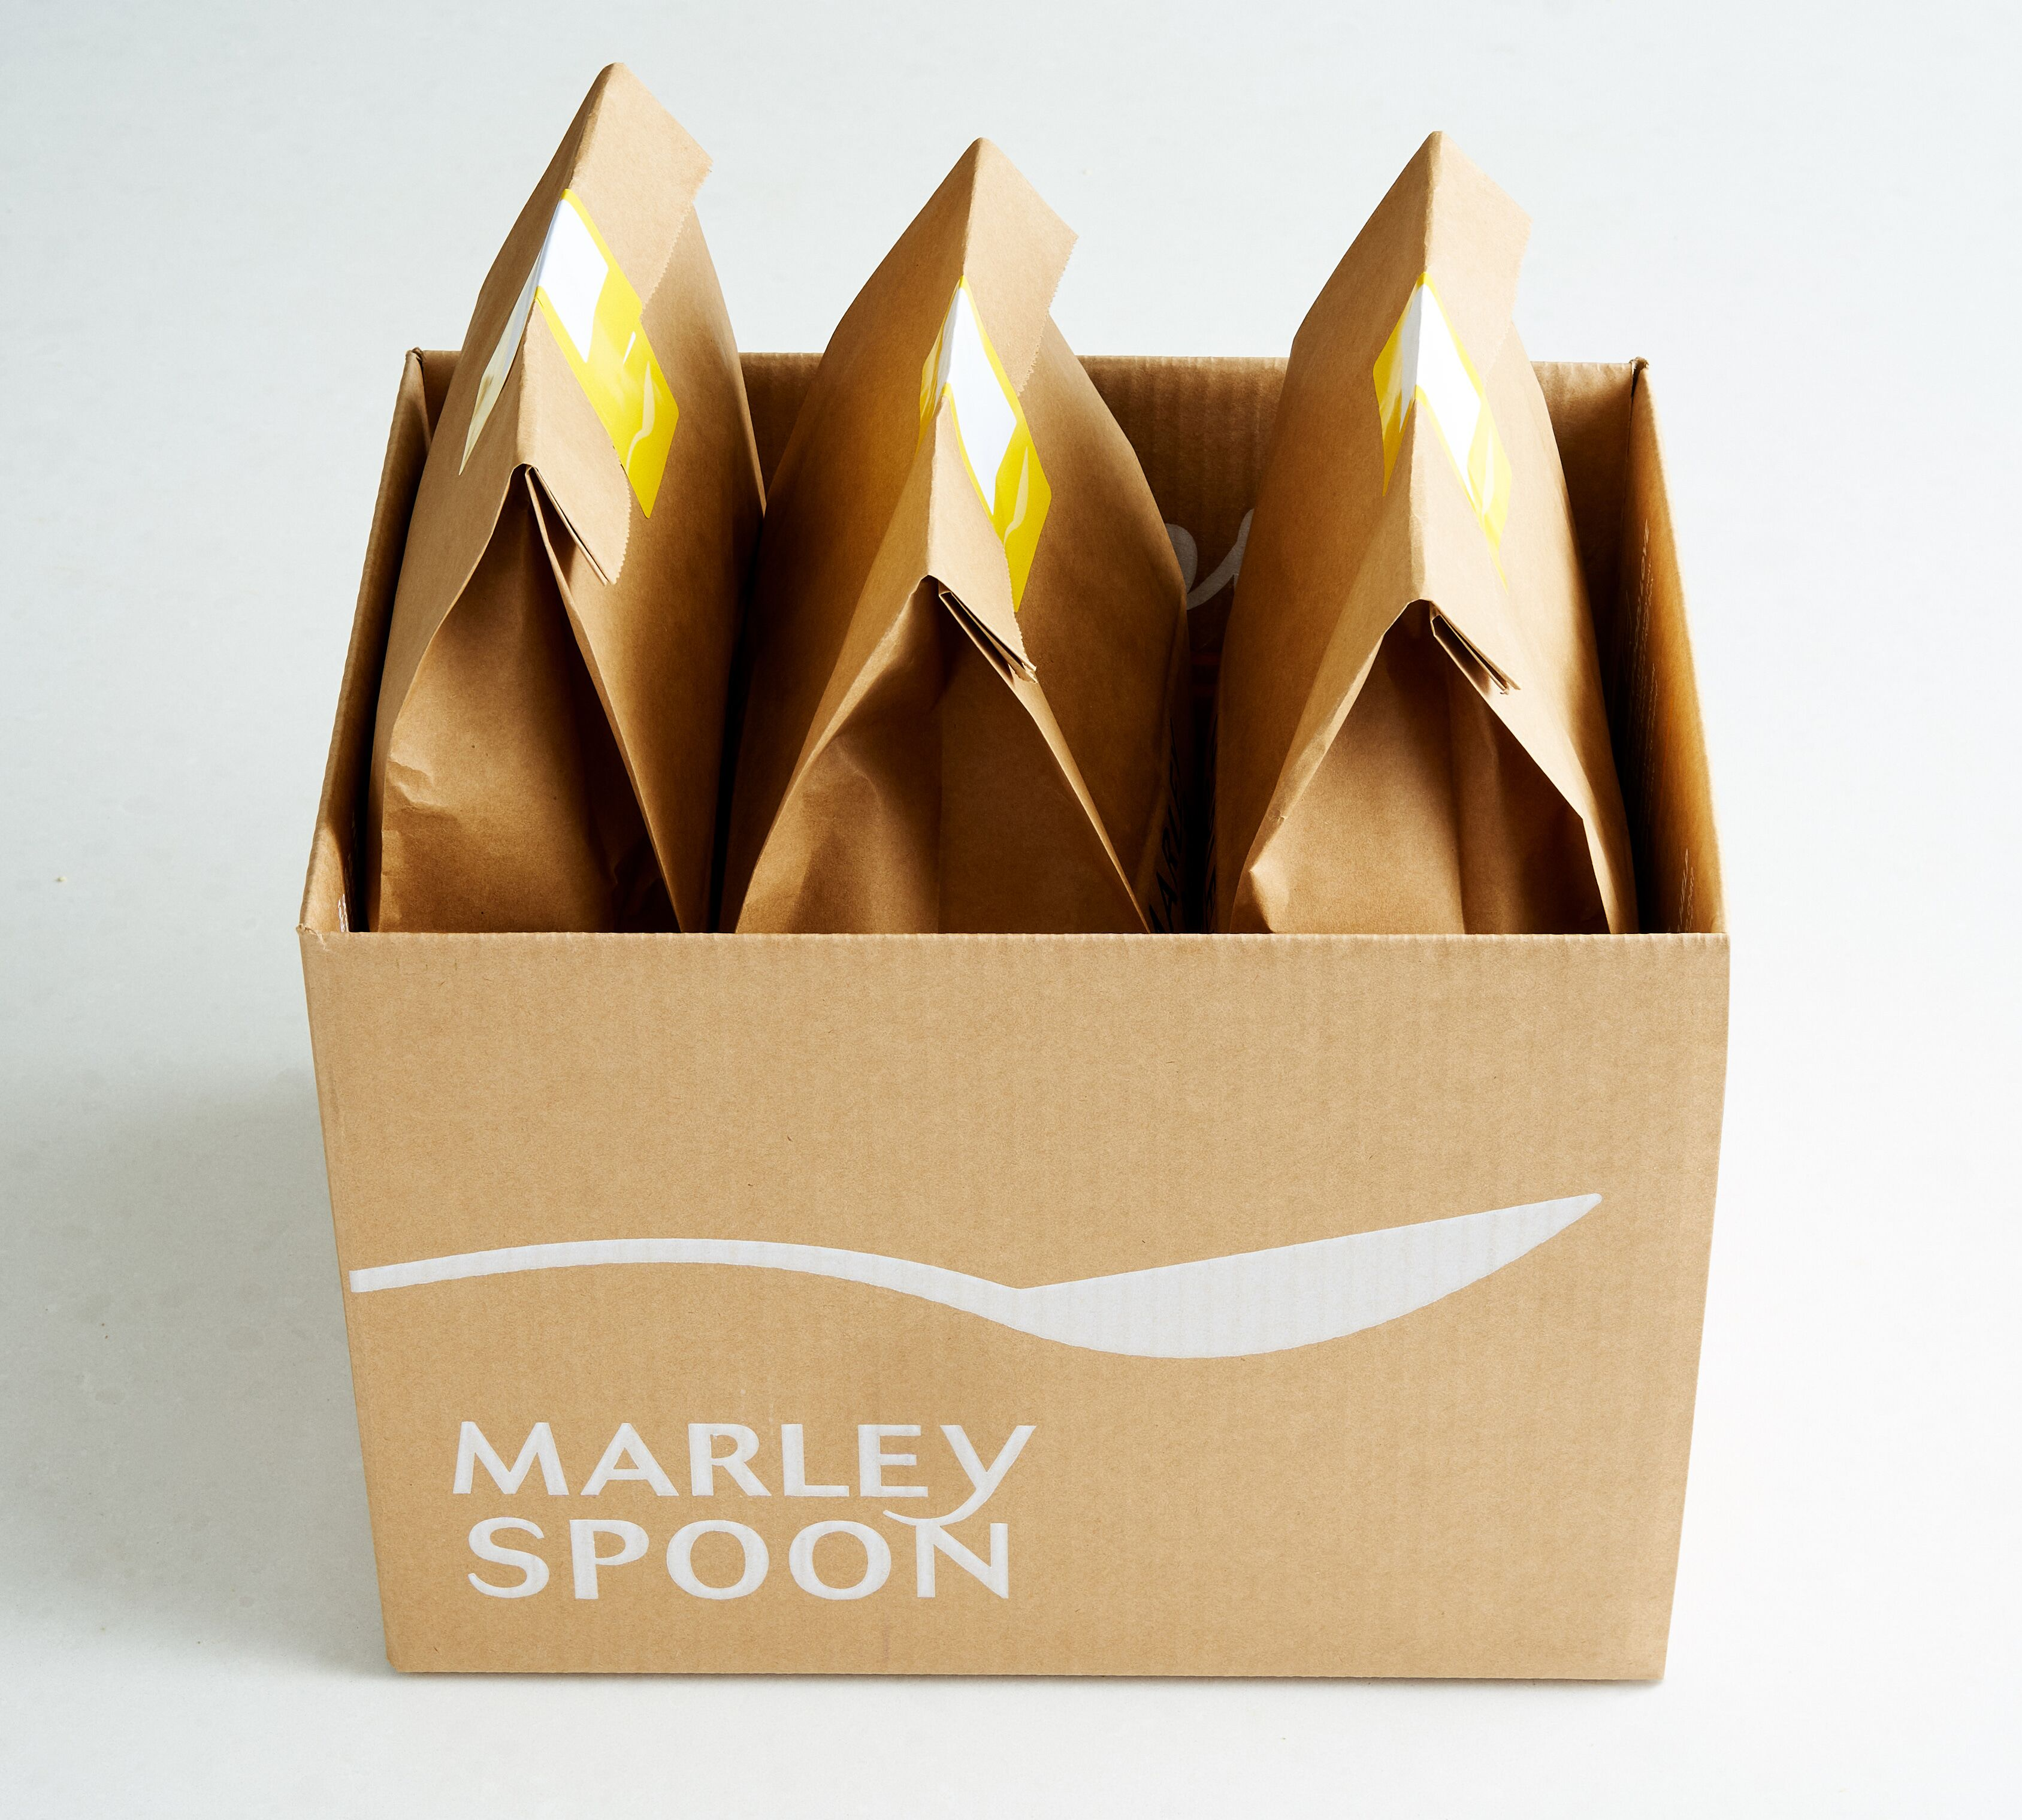 Marley Spoon release new vegan options across Australia